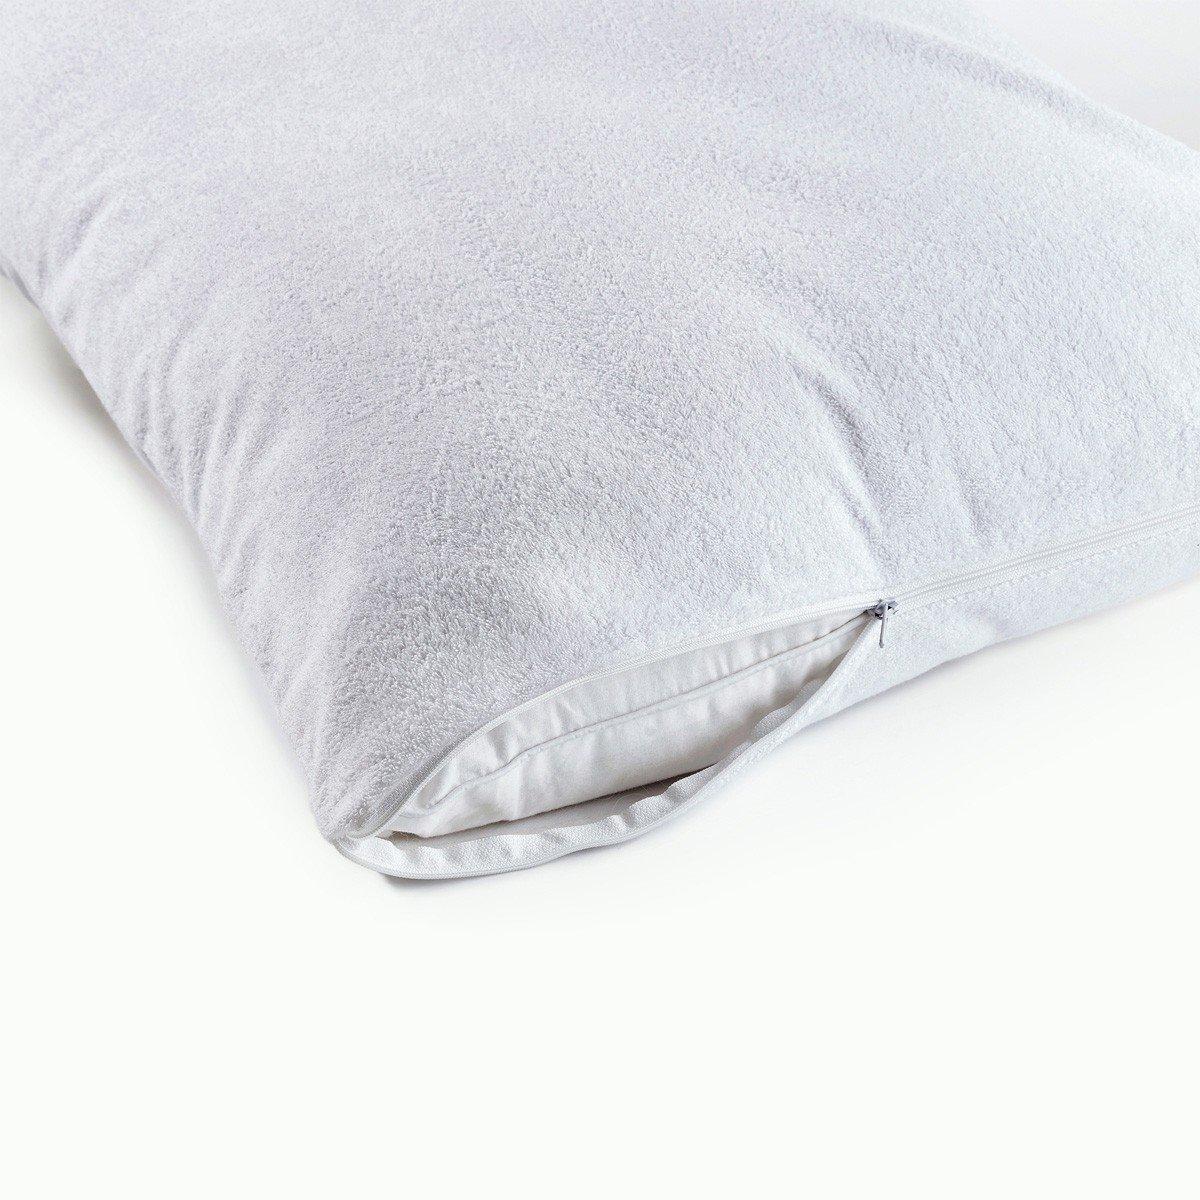 Moonrest – 2 Pack - %100 Waterproof Pillow Protector - Dust Mite, Bacteria, Allergy Control - Encasement - Bed Bug Proof (Standard 20'' x 26'')